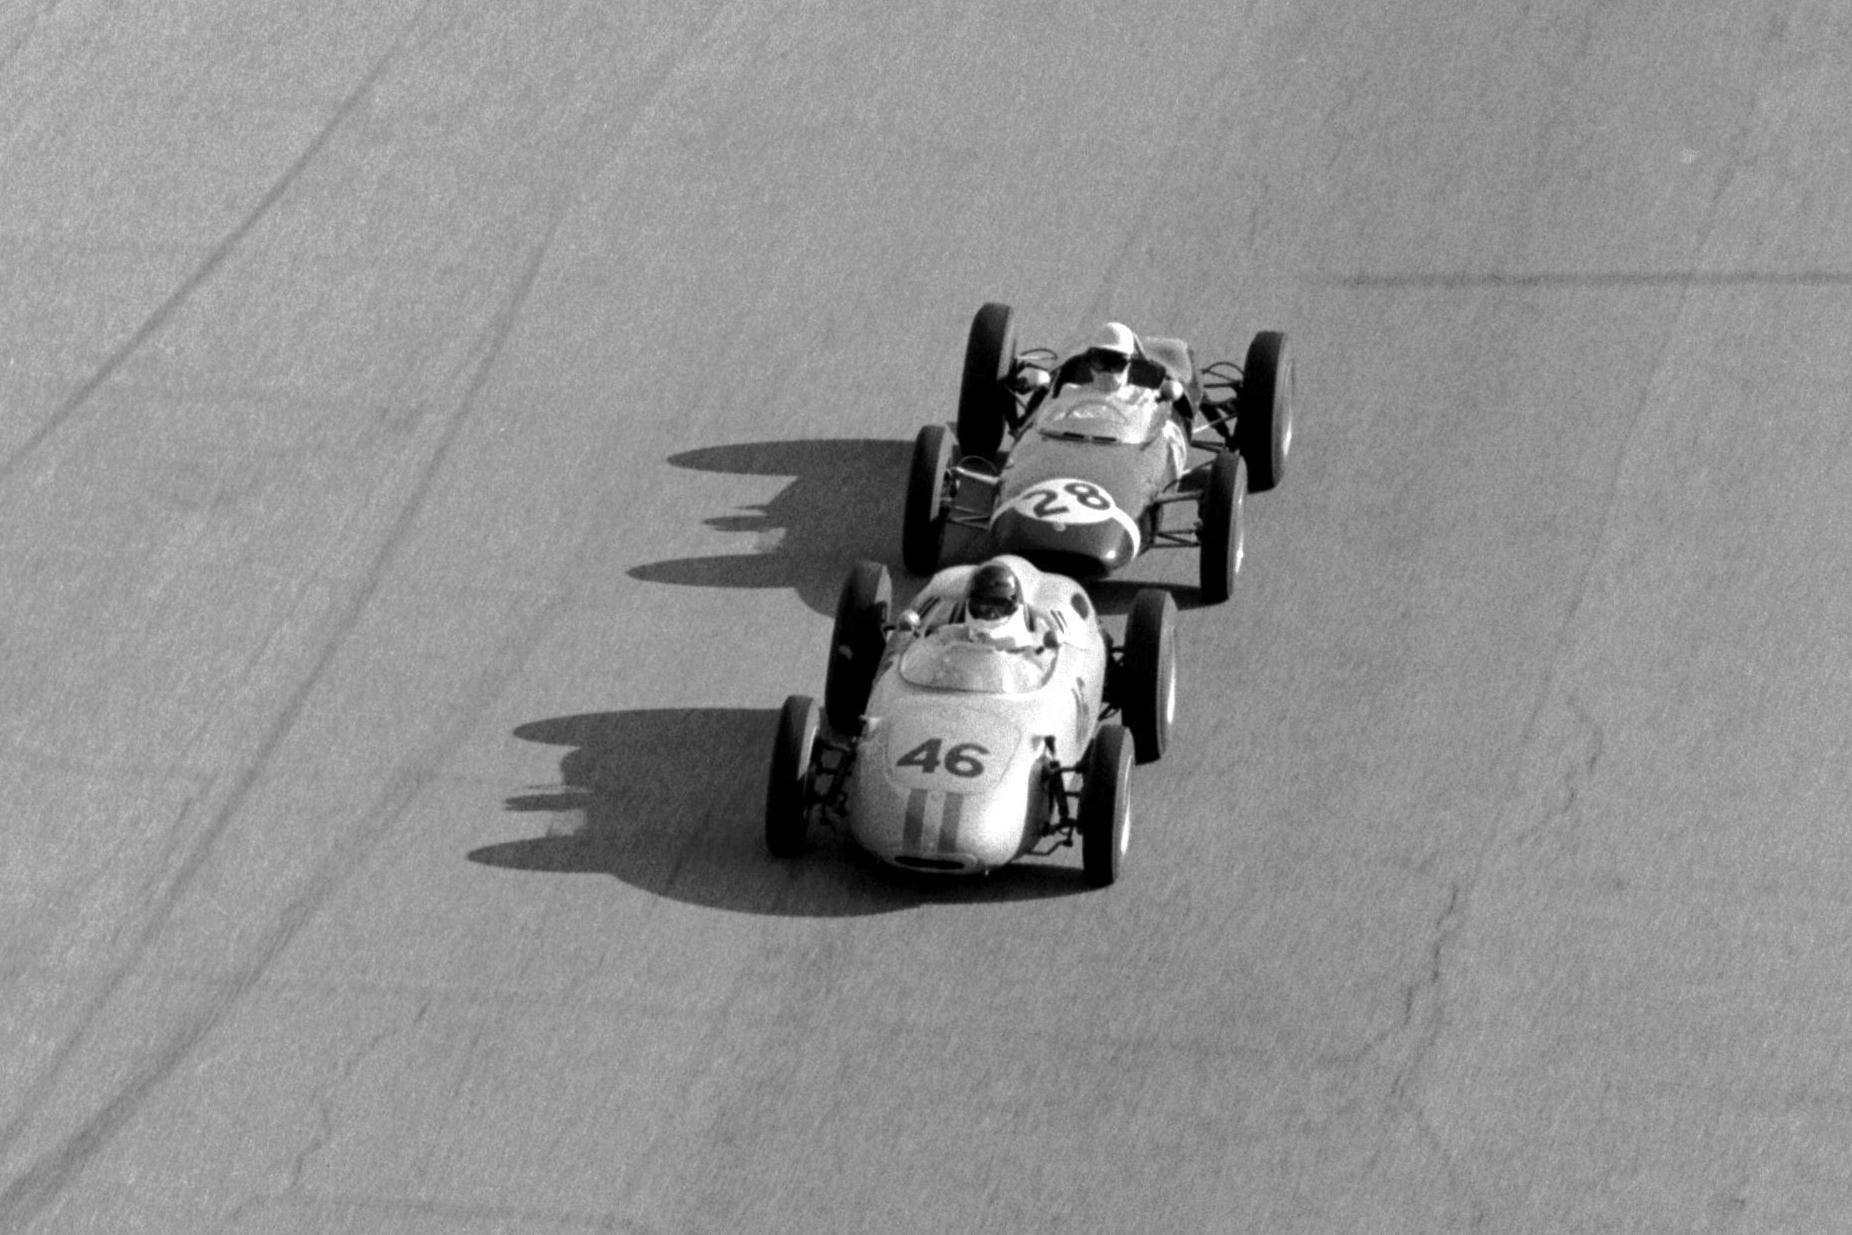 Dan Gurney in a Porsche 718 leads Stirling Moss.